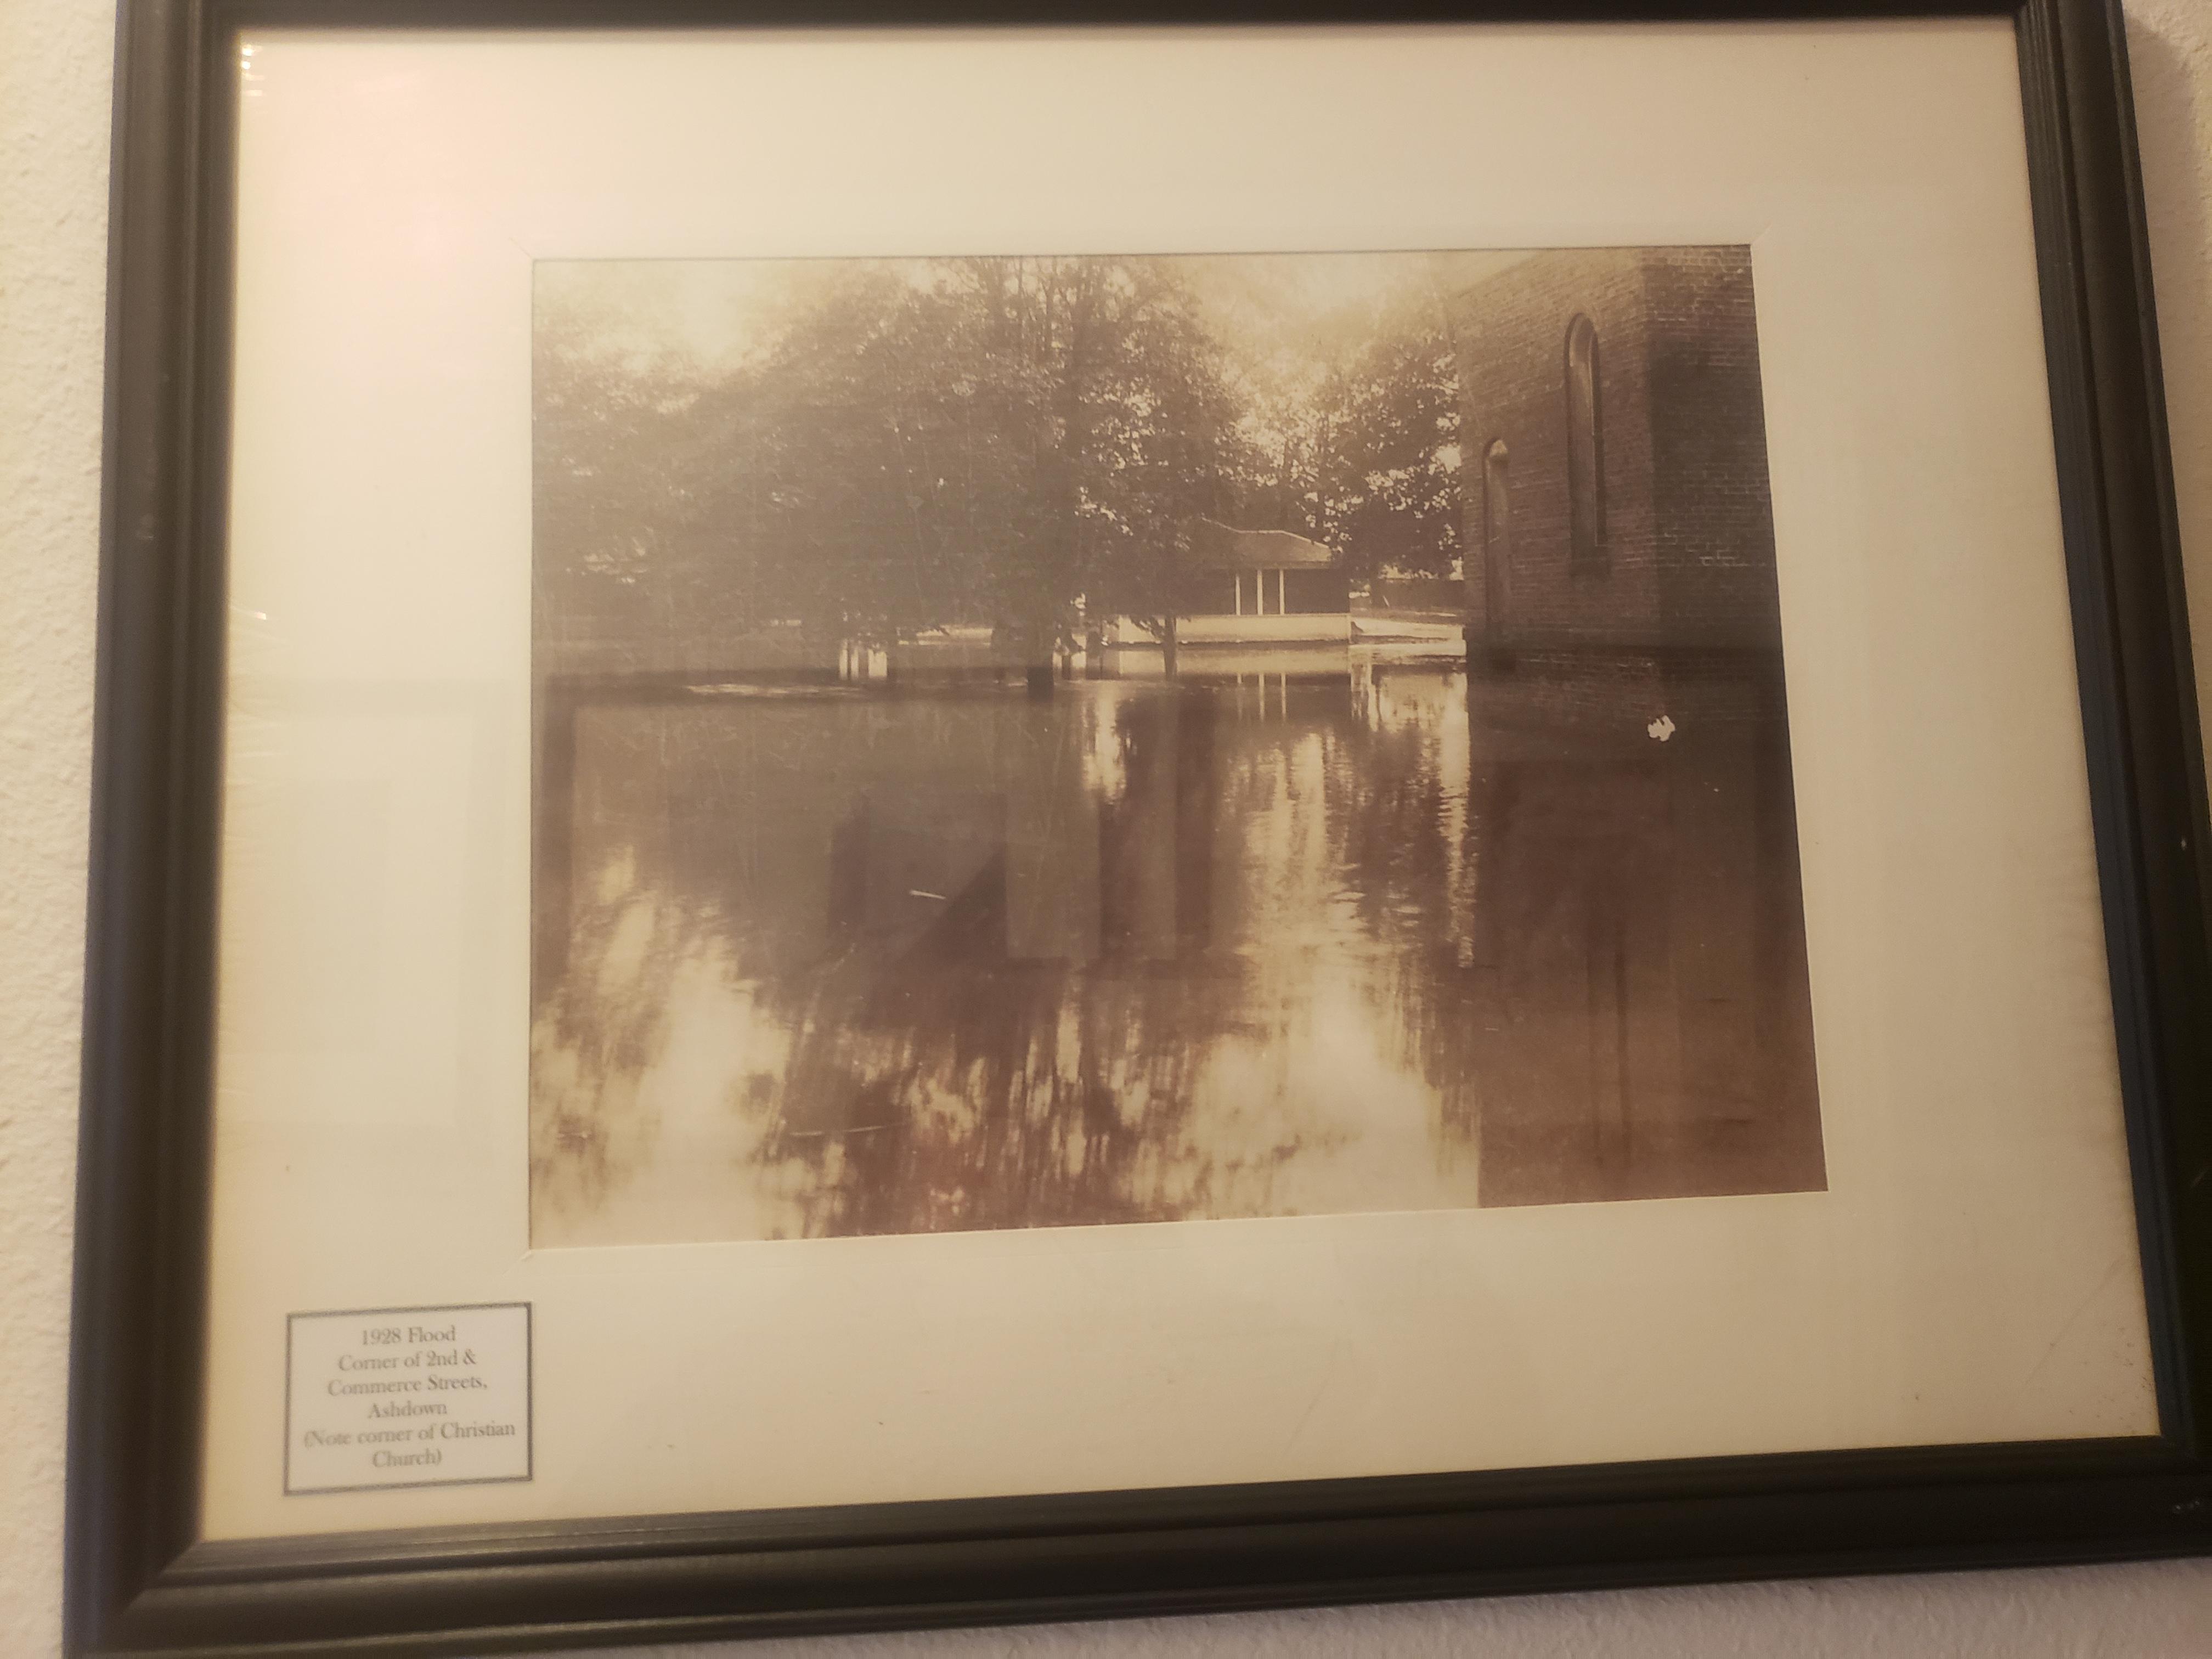 1928 Flood. Corner of 2nd & Commerce Streets, Ashdown. (Note corner of Christian Church)